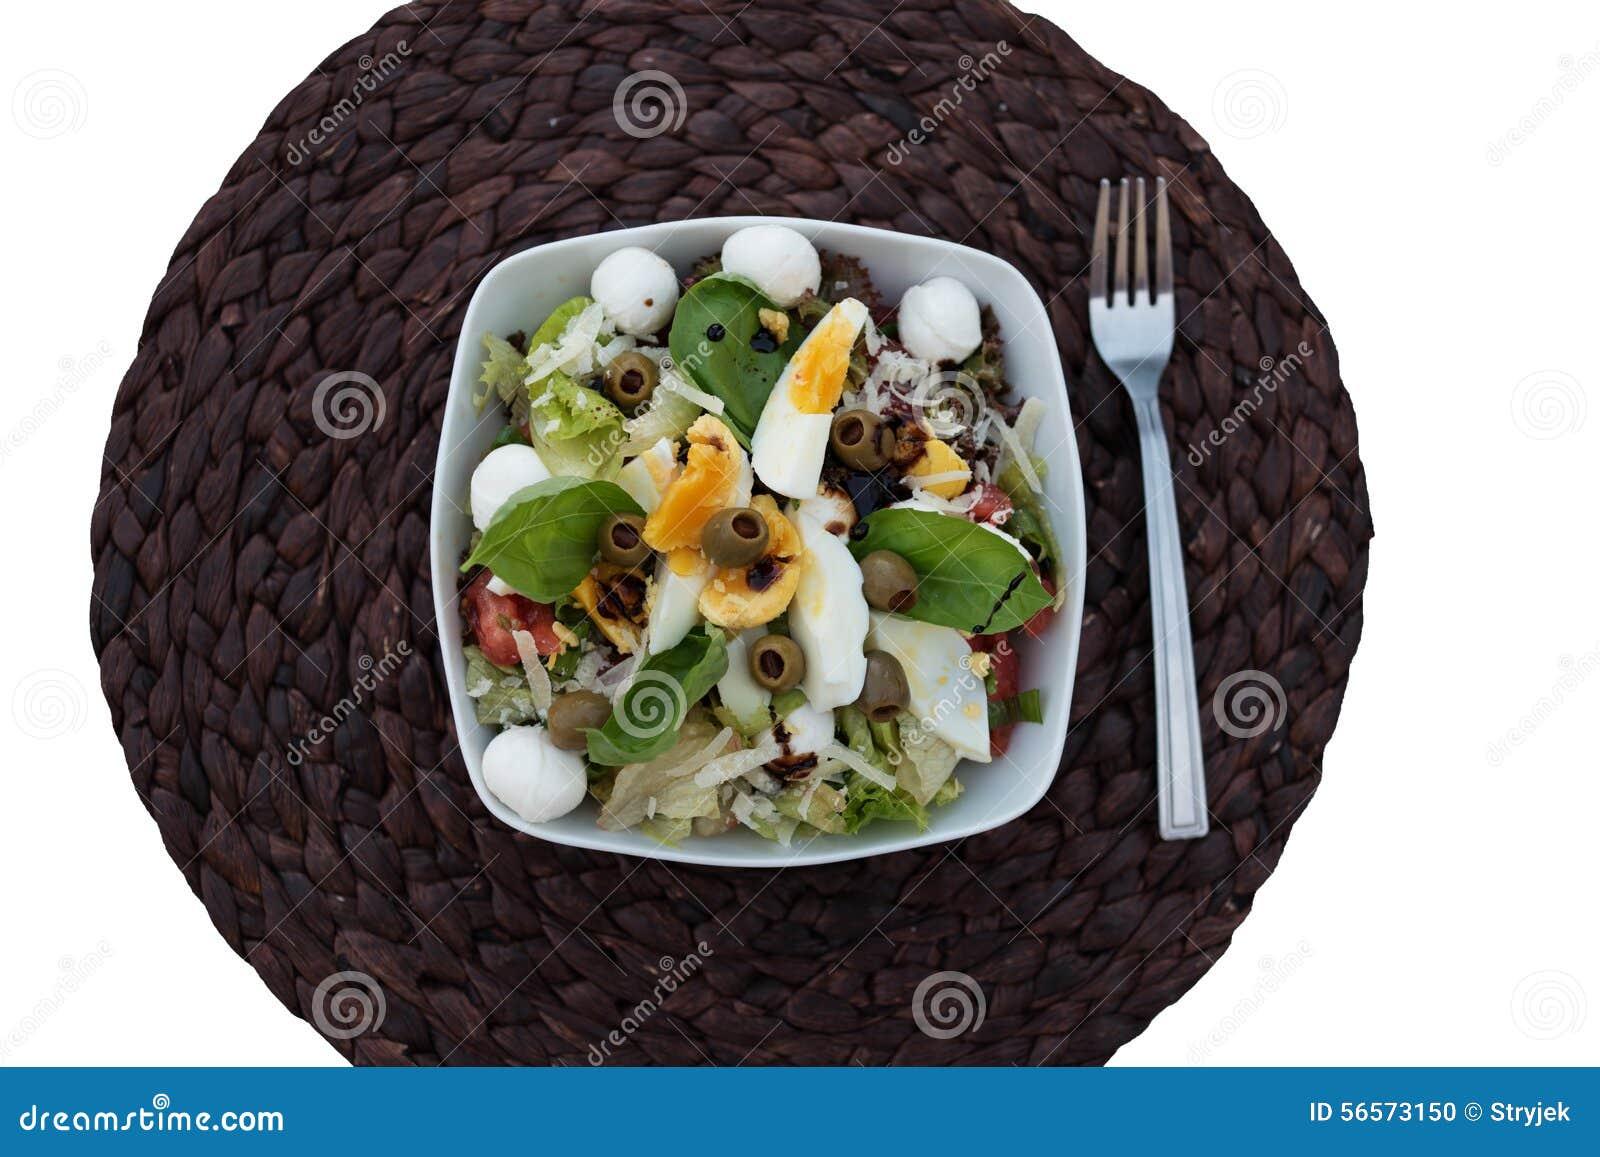 Download Γαστρονομικά θρεπτικά τρόφιμα στο κύπελλο σε στρογγυλό Placemat Στοκ Εικόνες - εικόνα από θρεπτικός, αυγά: 56573150